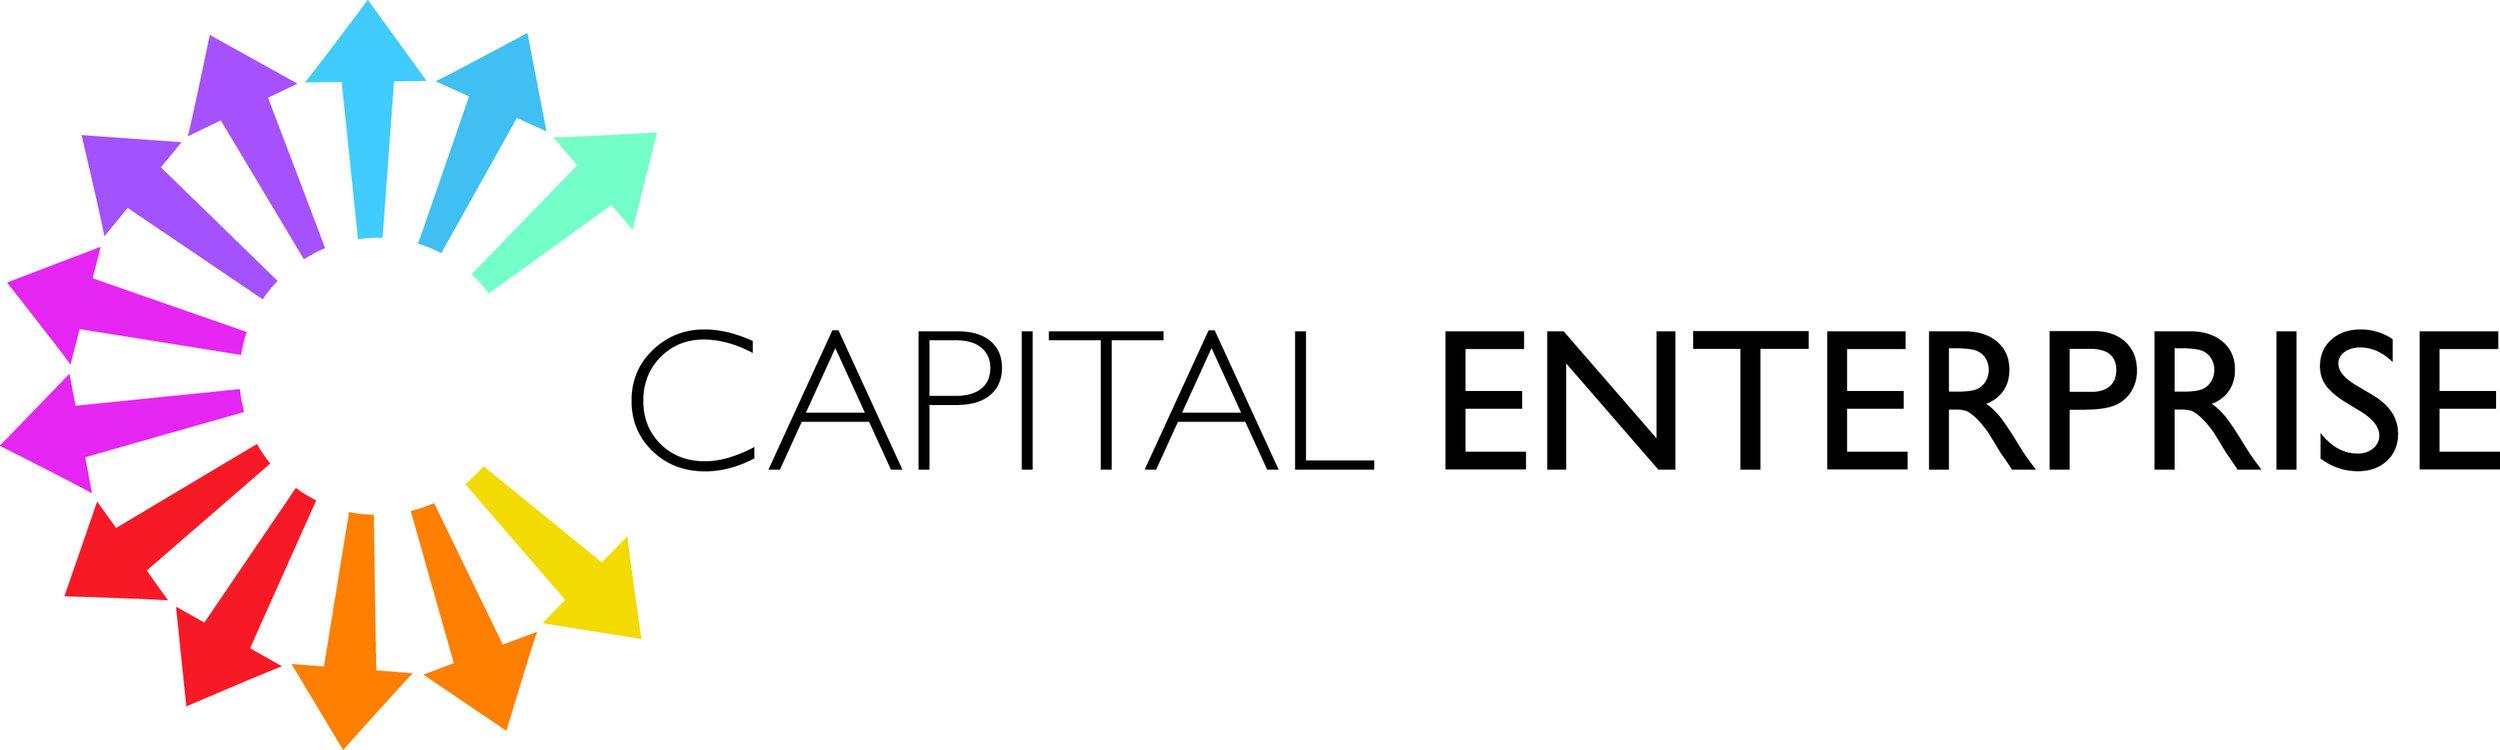 CE logo.jpg